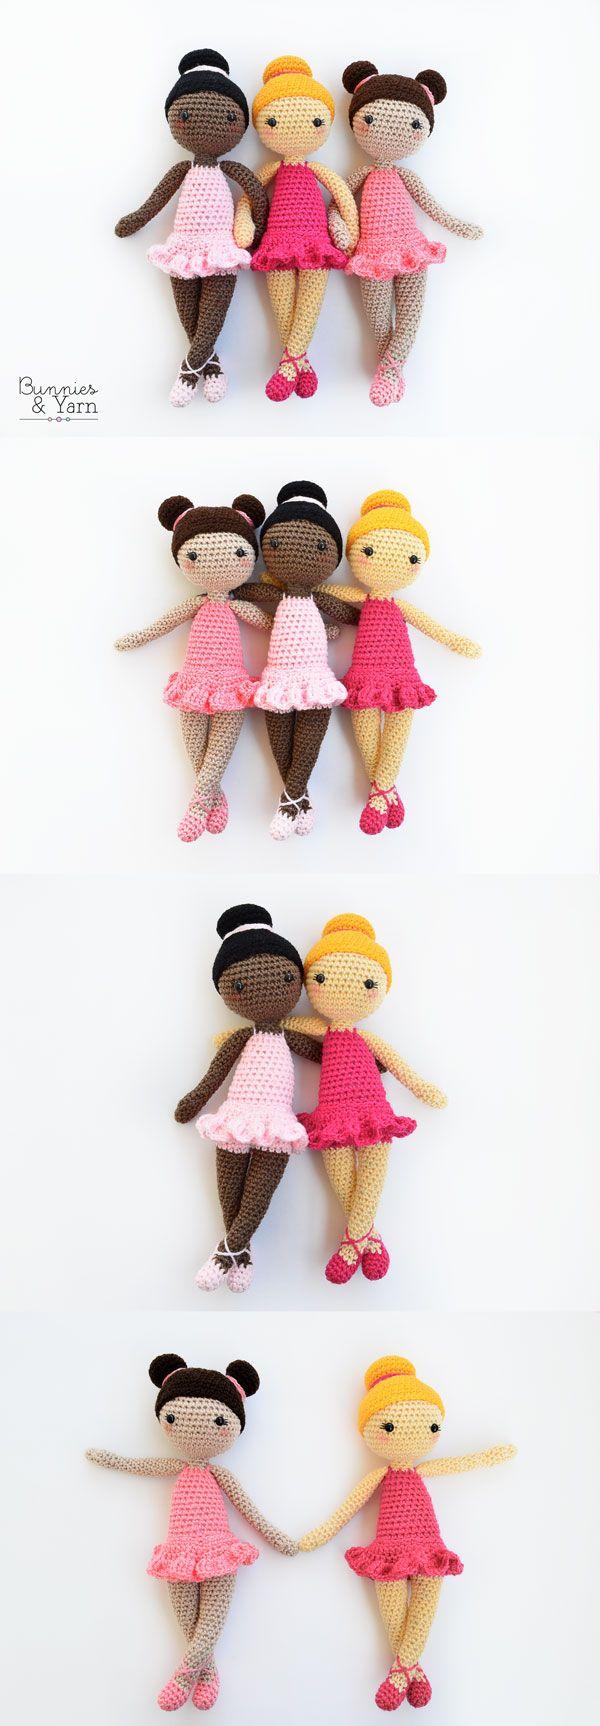 Crochet Pattern - Tracey the Ballerina Doll - Amigurumi   Bunnies ...